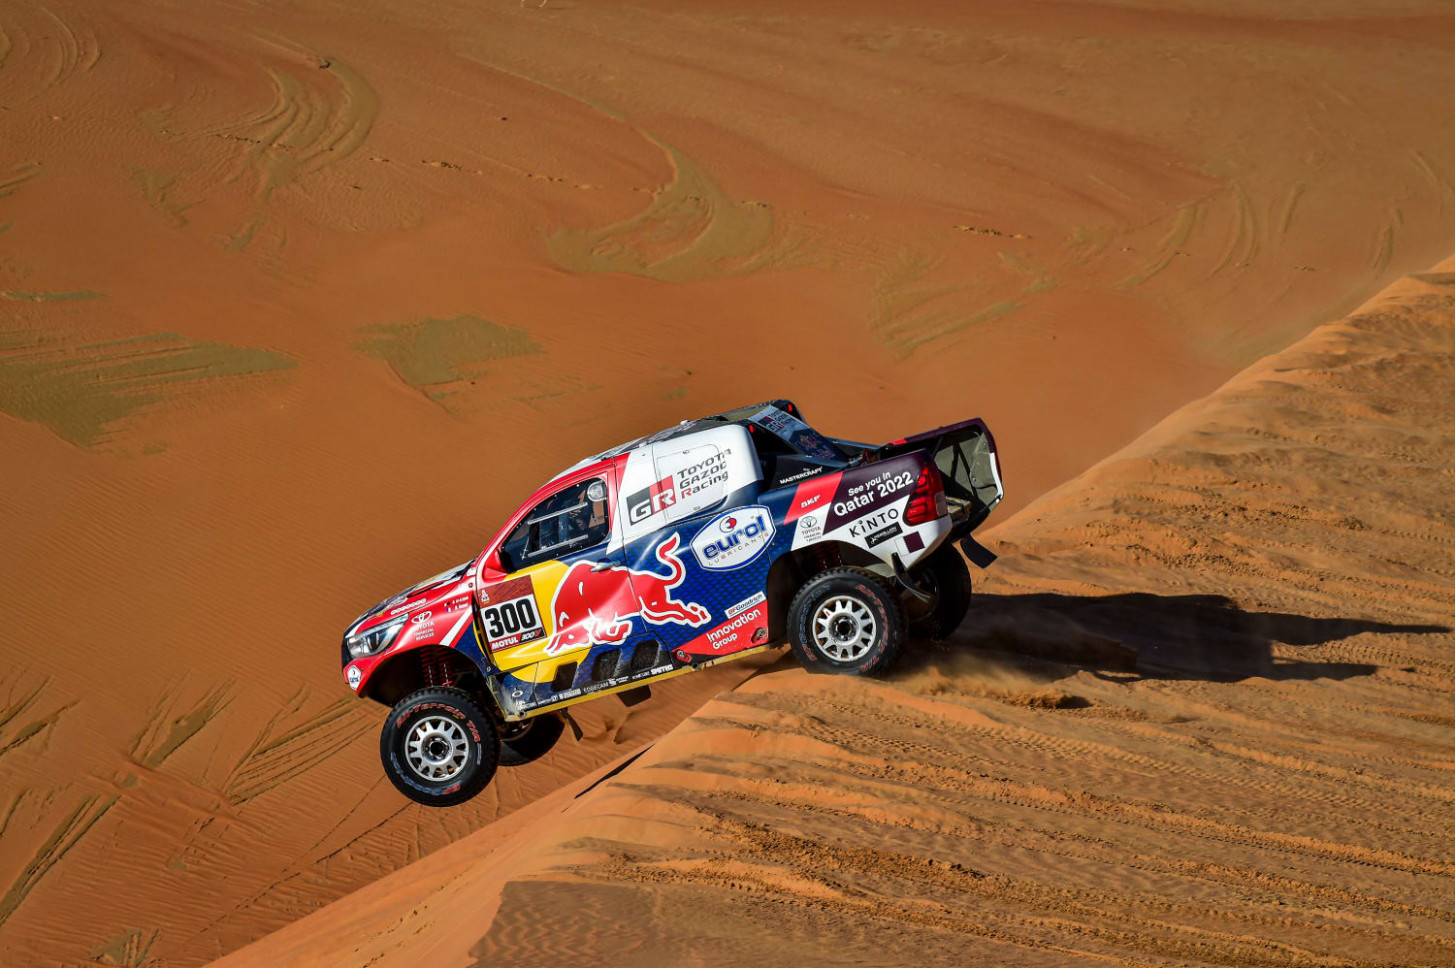 Redesign and Concept Toyota Dakar 2022